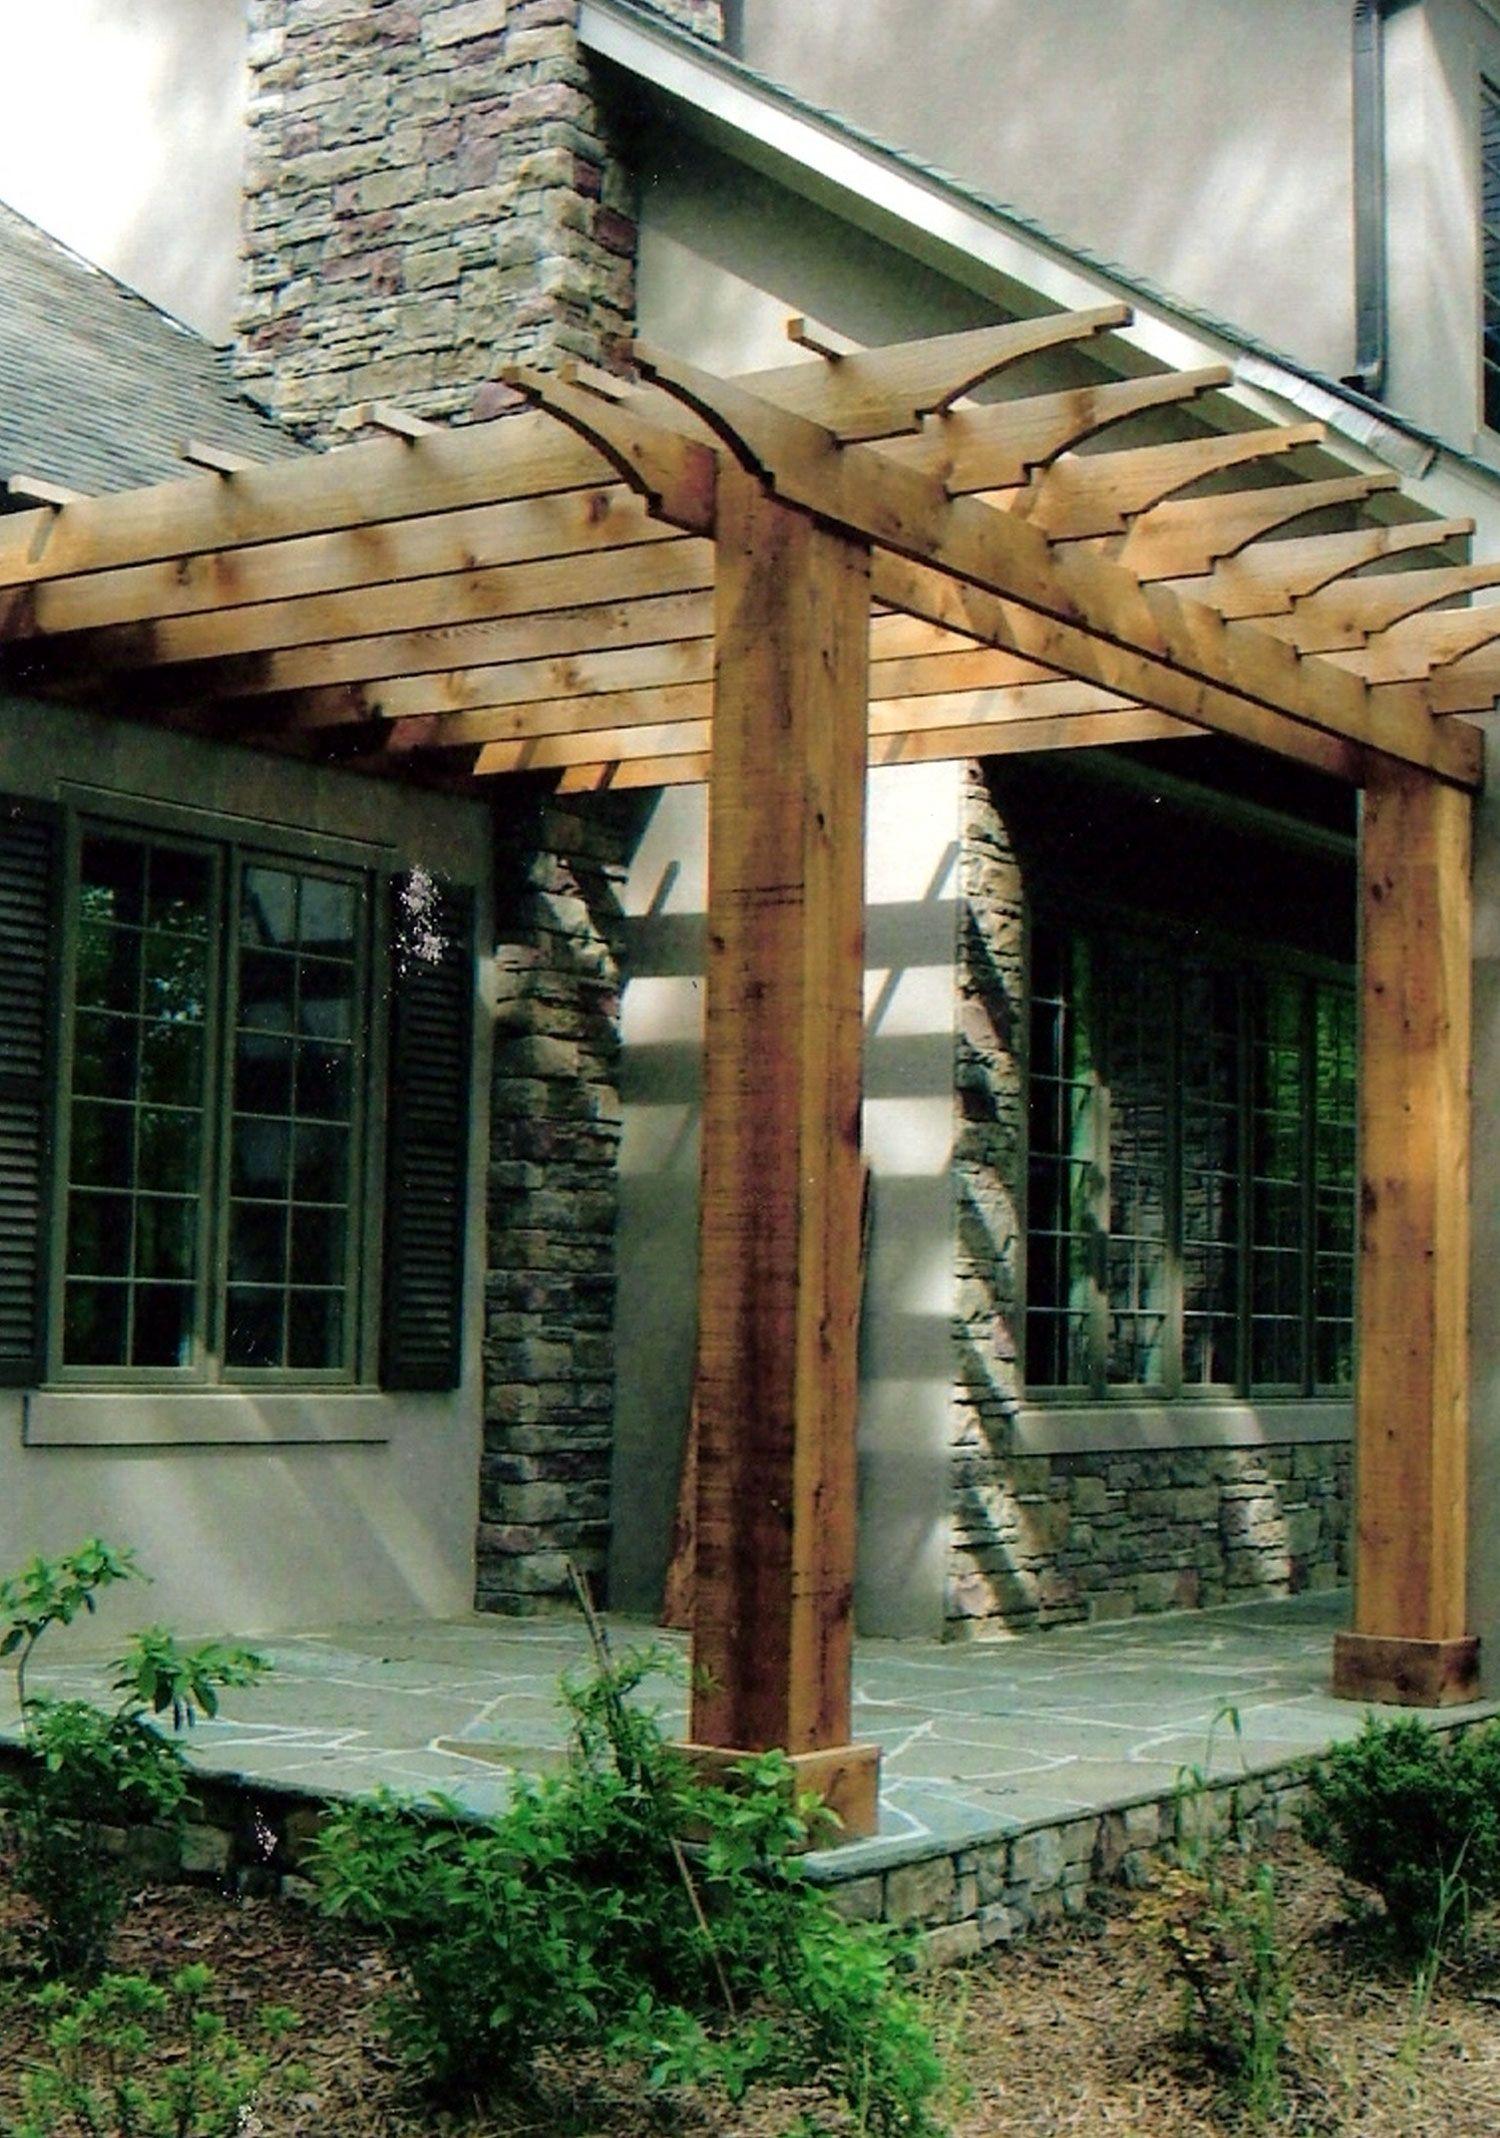 pergolas and arbors | outdoor living improvements: arbors and